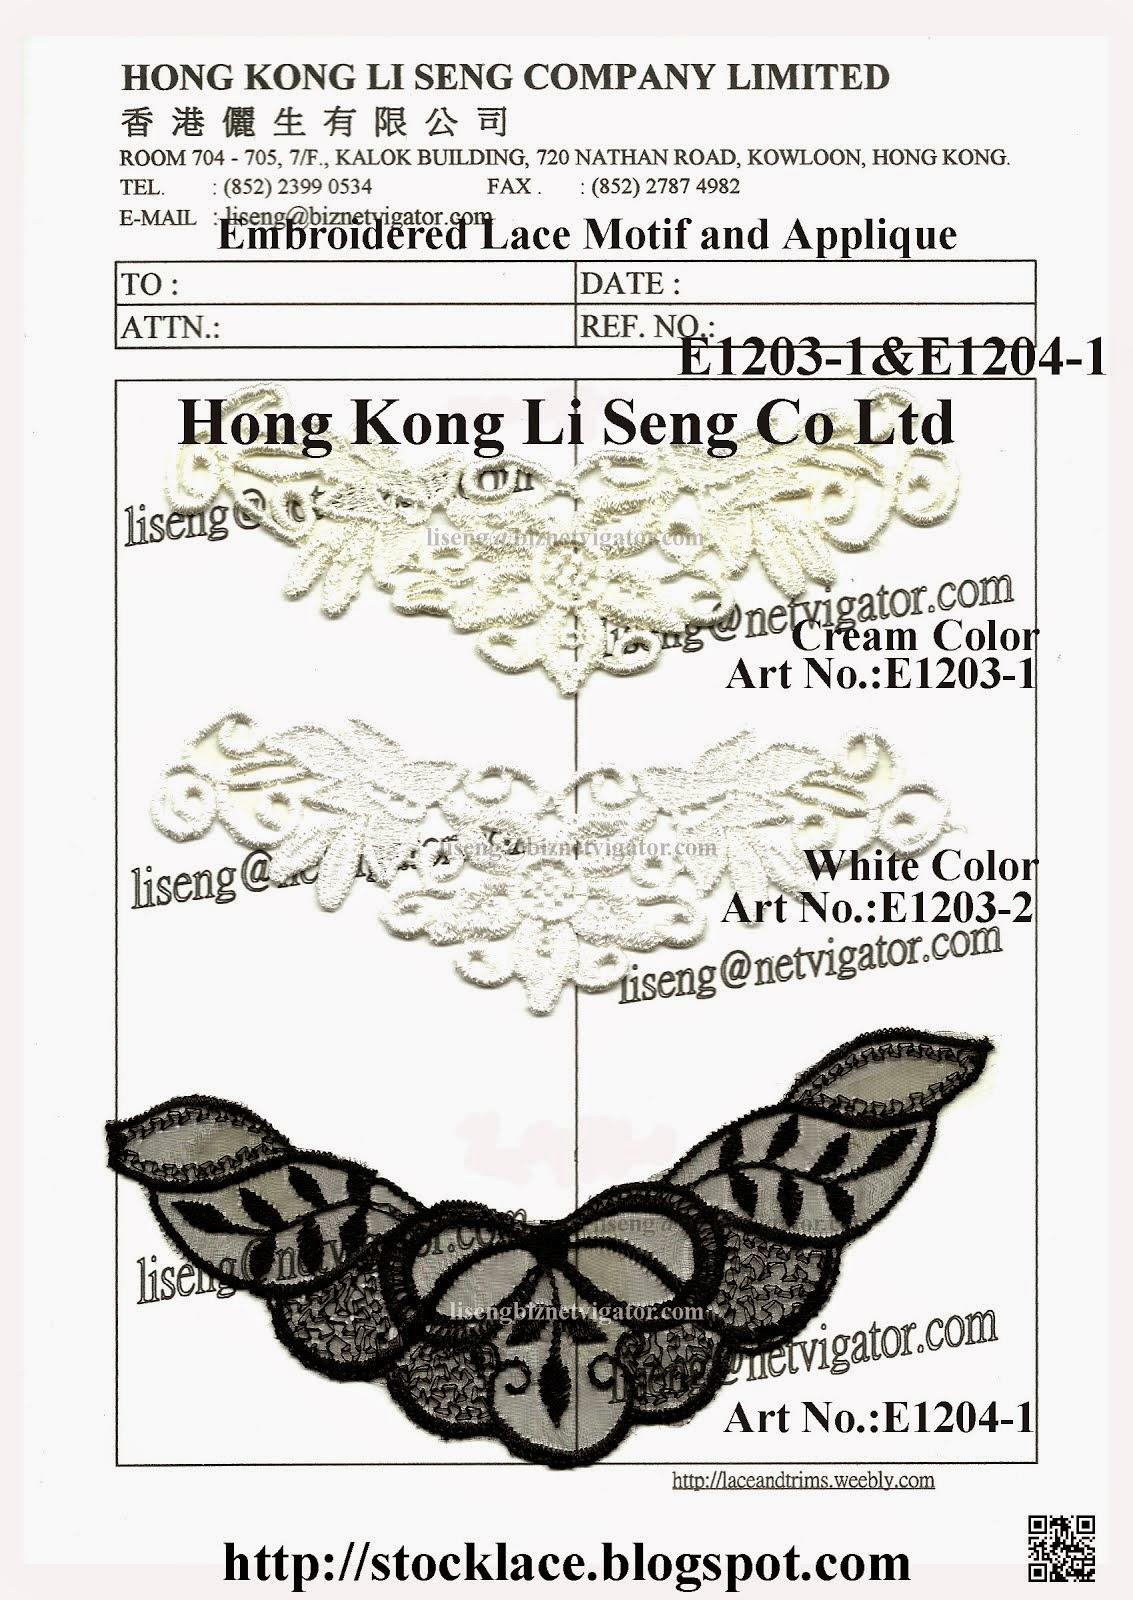 Small Order for stocklot Lace Motif and Applique Manufacturer - Hong Kong Li Seng Co Ltd